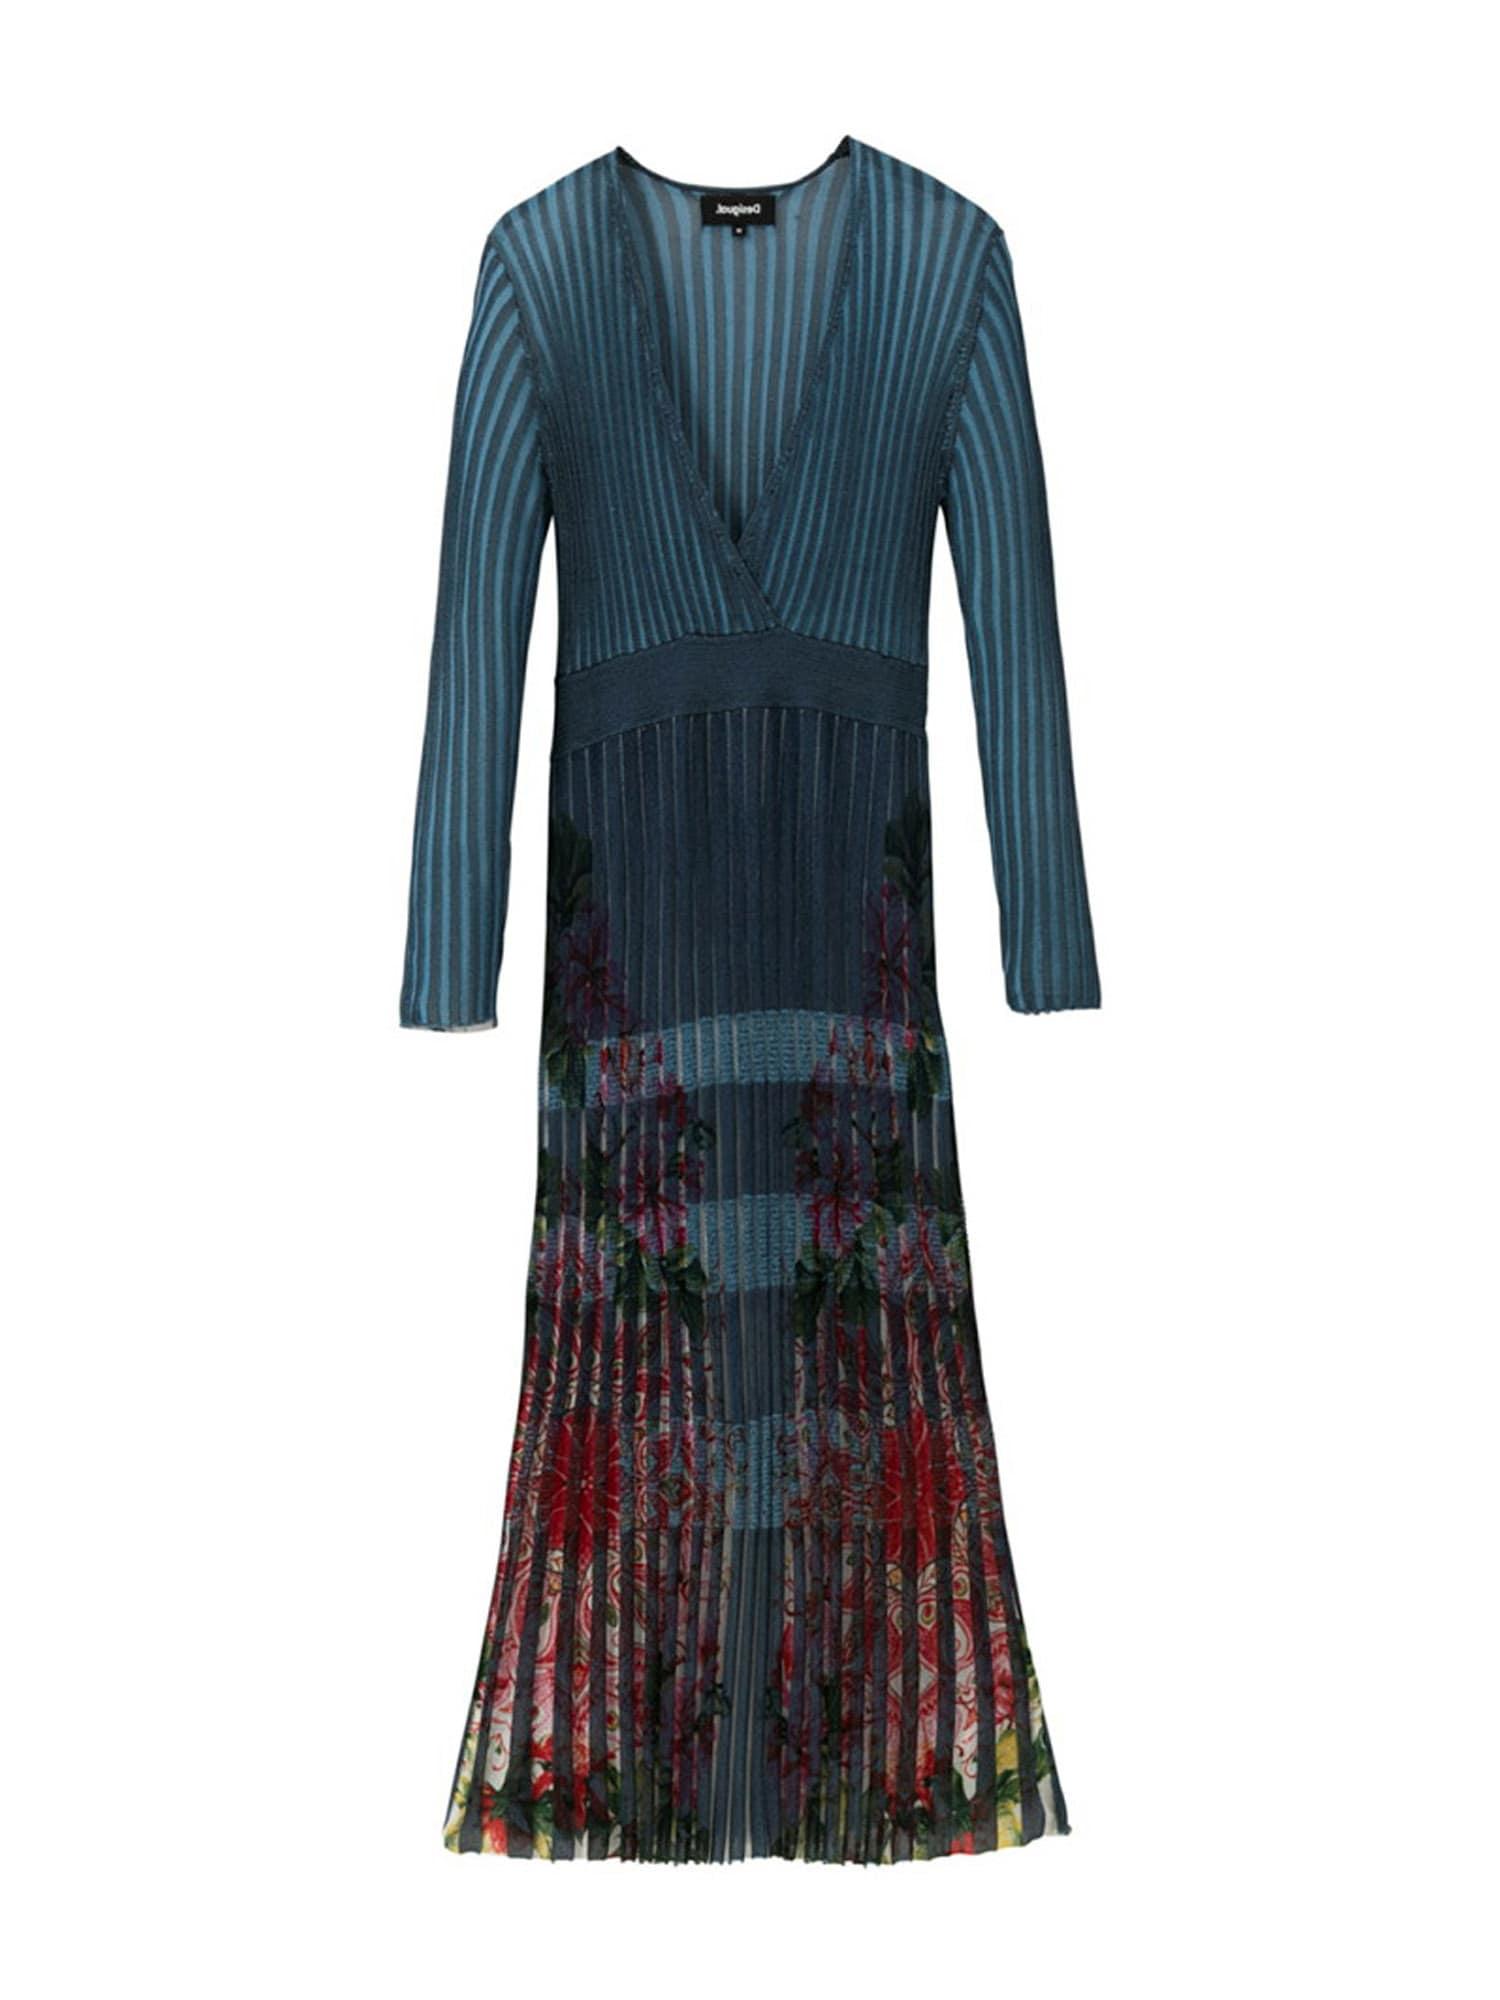 Desigual Megzta suknelė dangaus žydra / mišrios spalvos